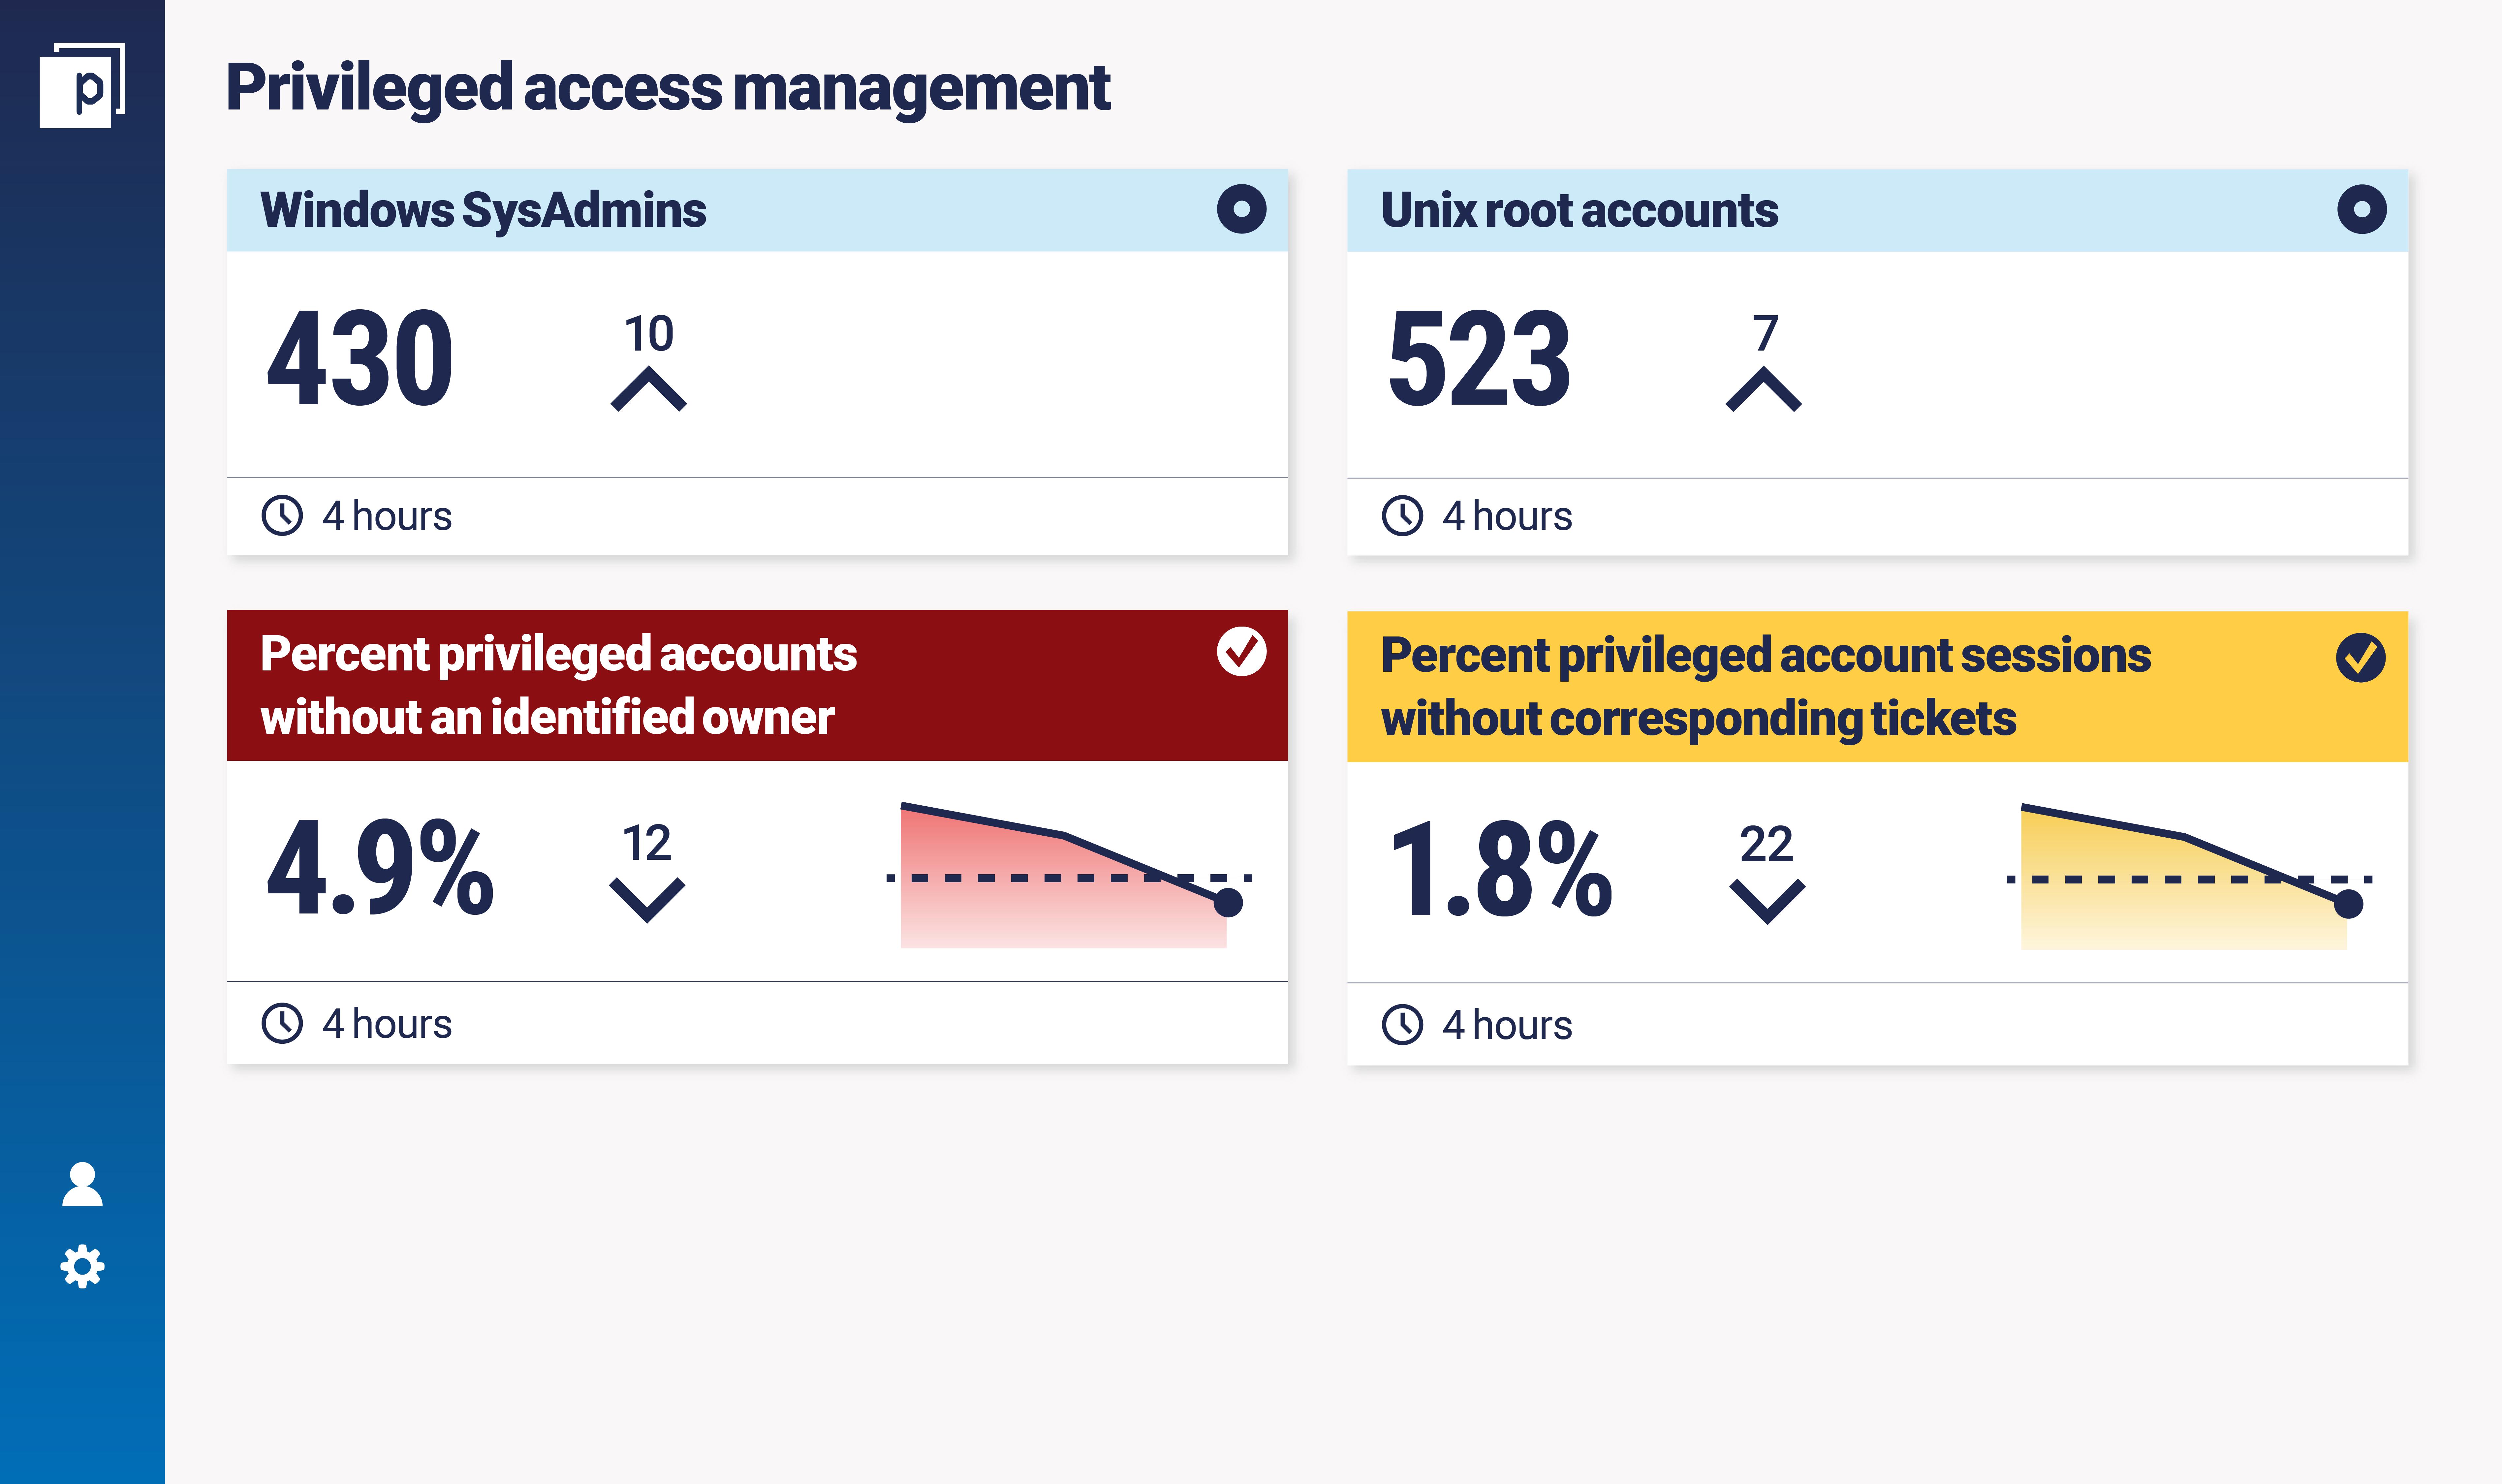 Privileged access management metrics dashboard